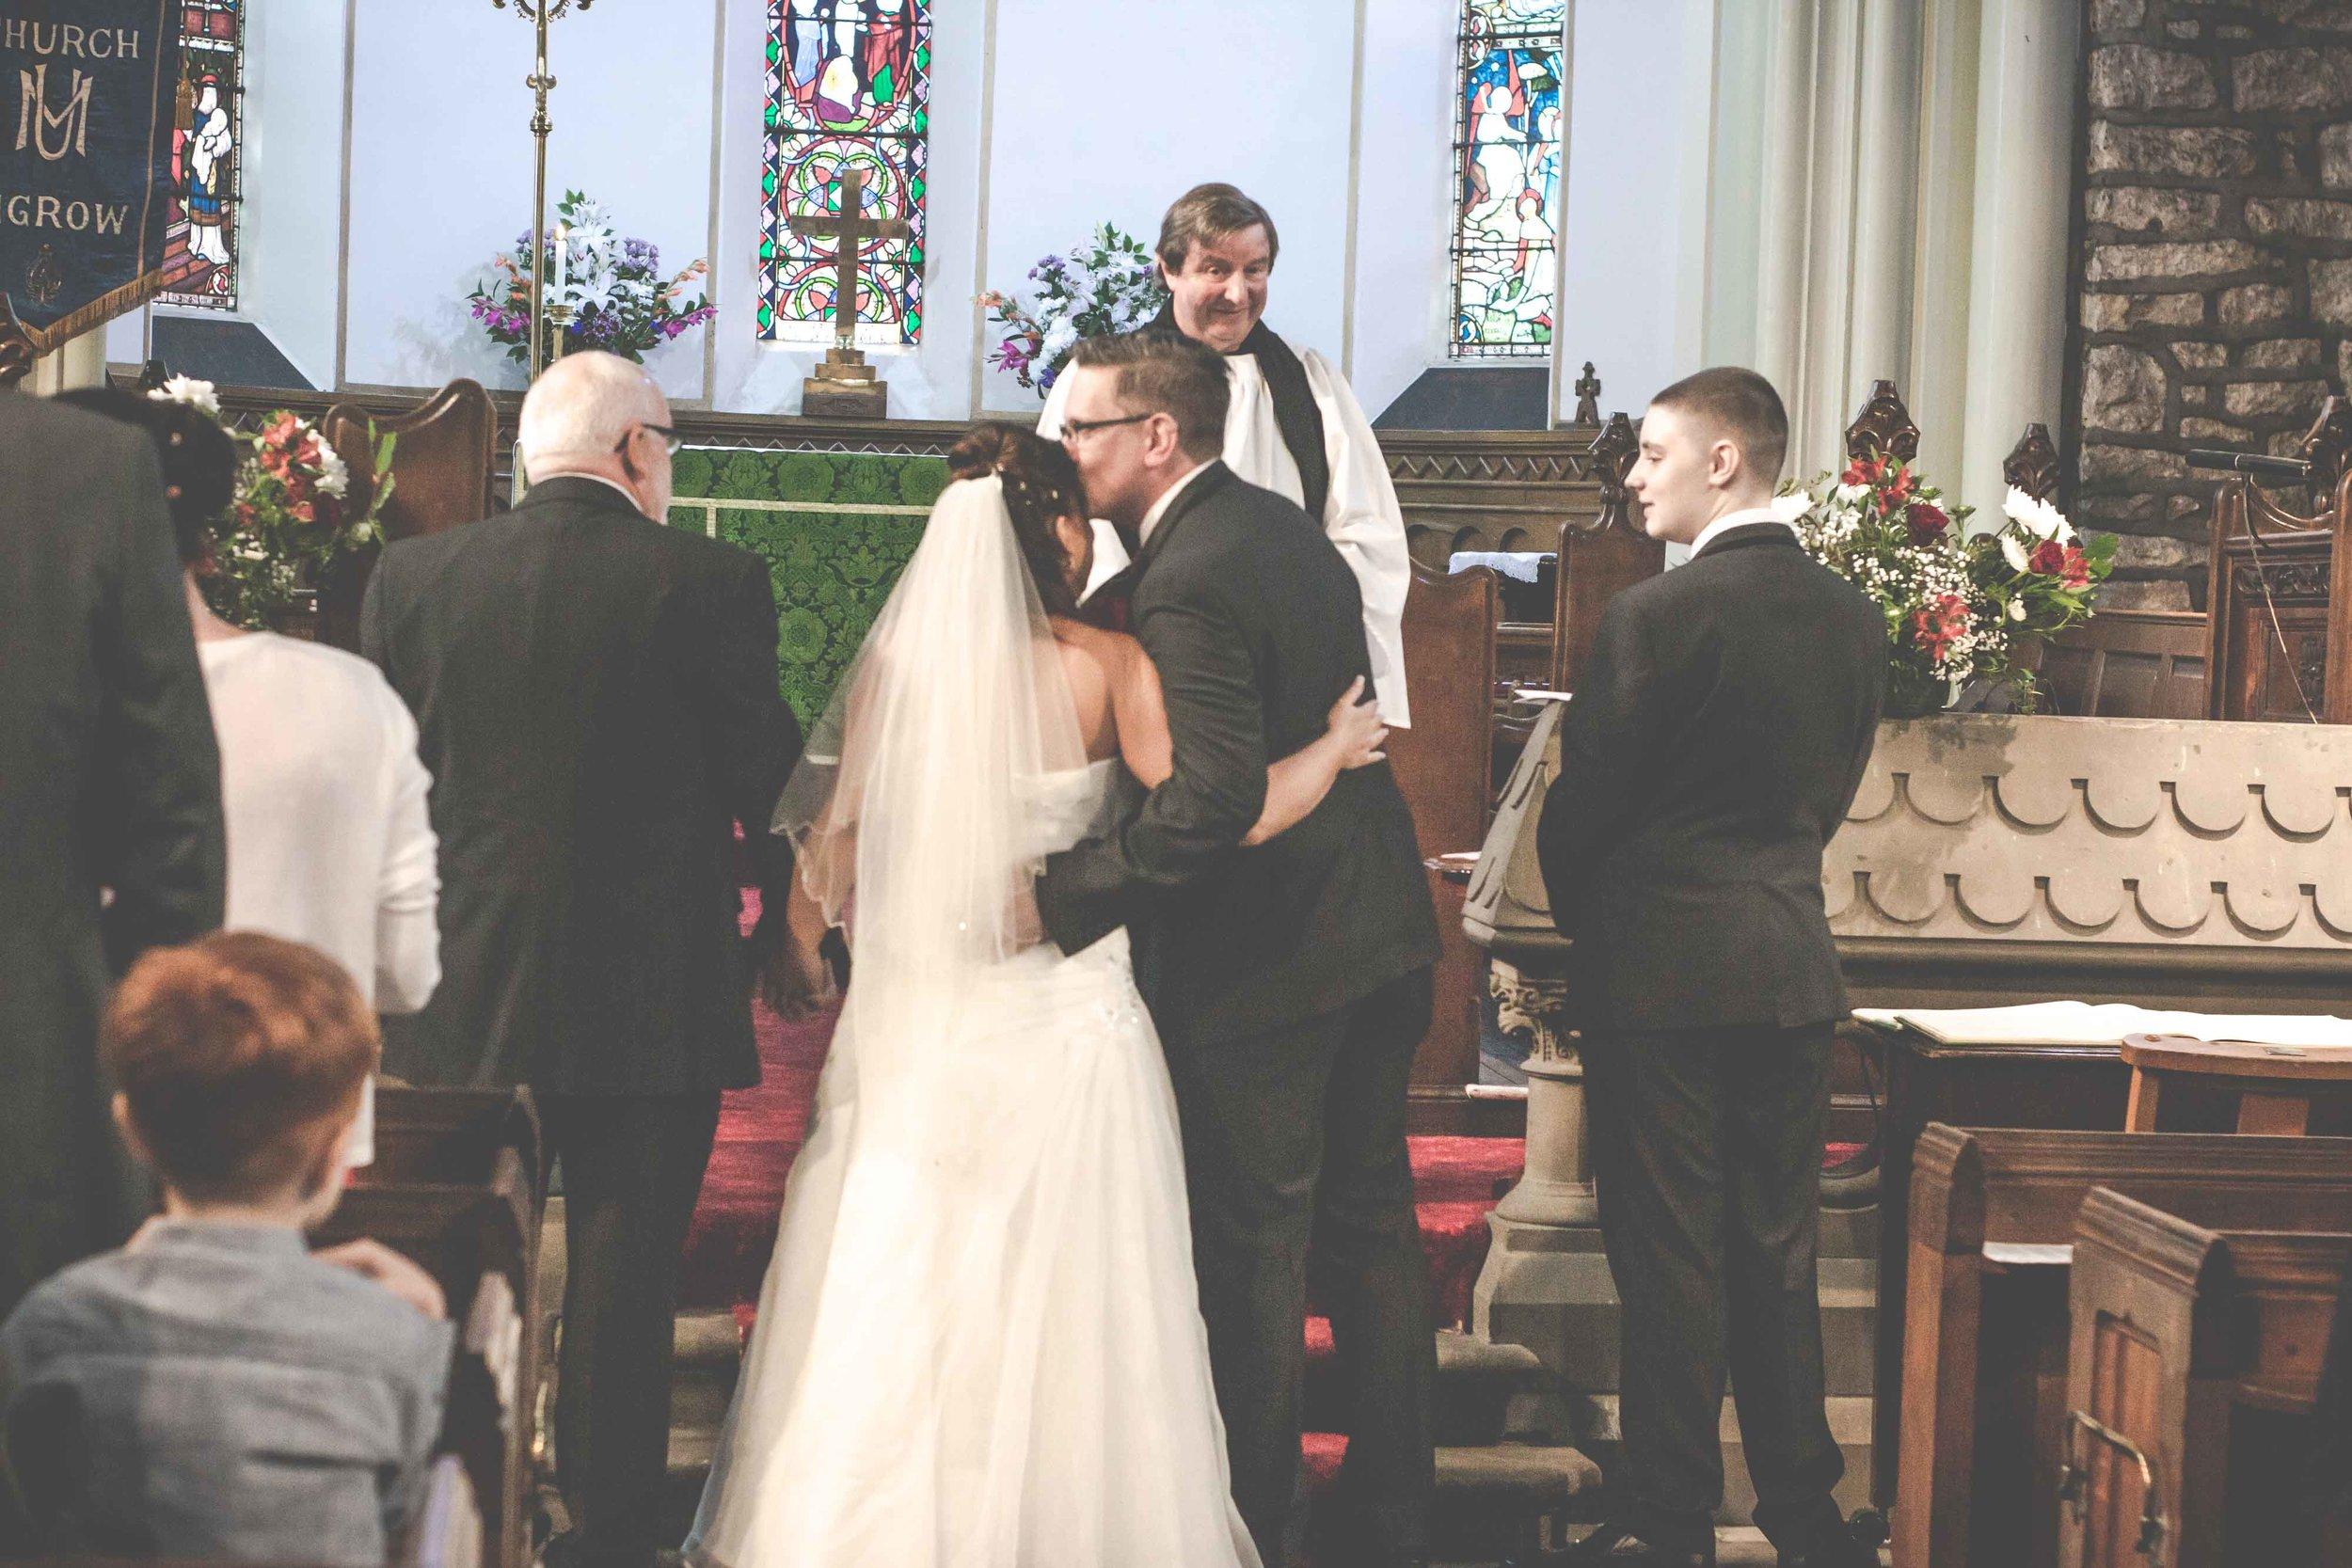 st-johns-ingrow-keighley-wedding-photos-12